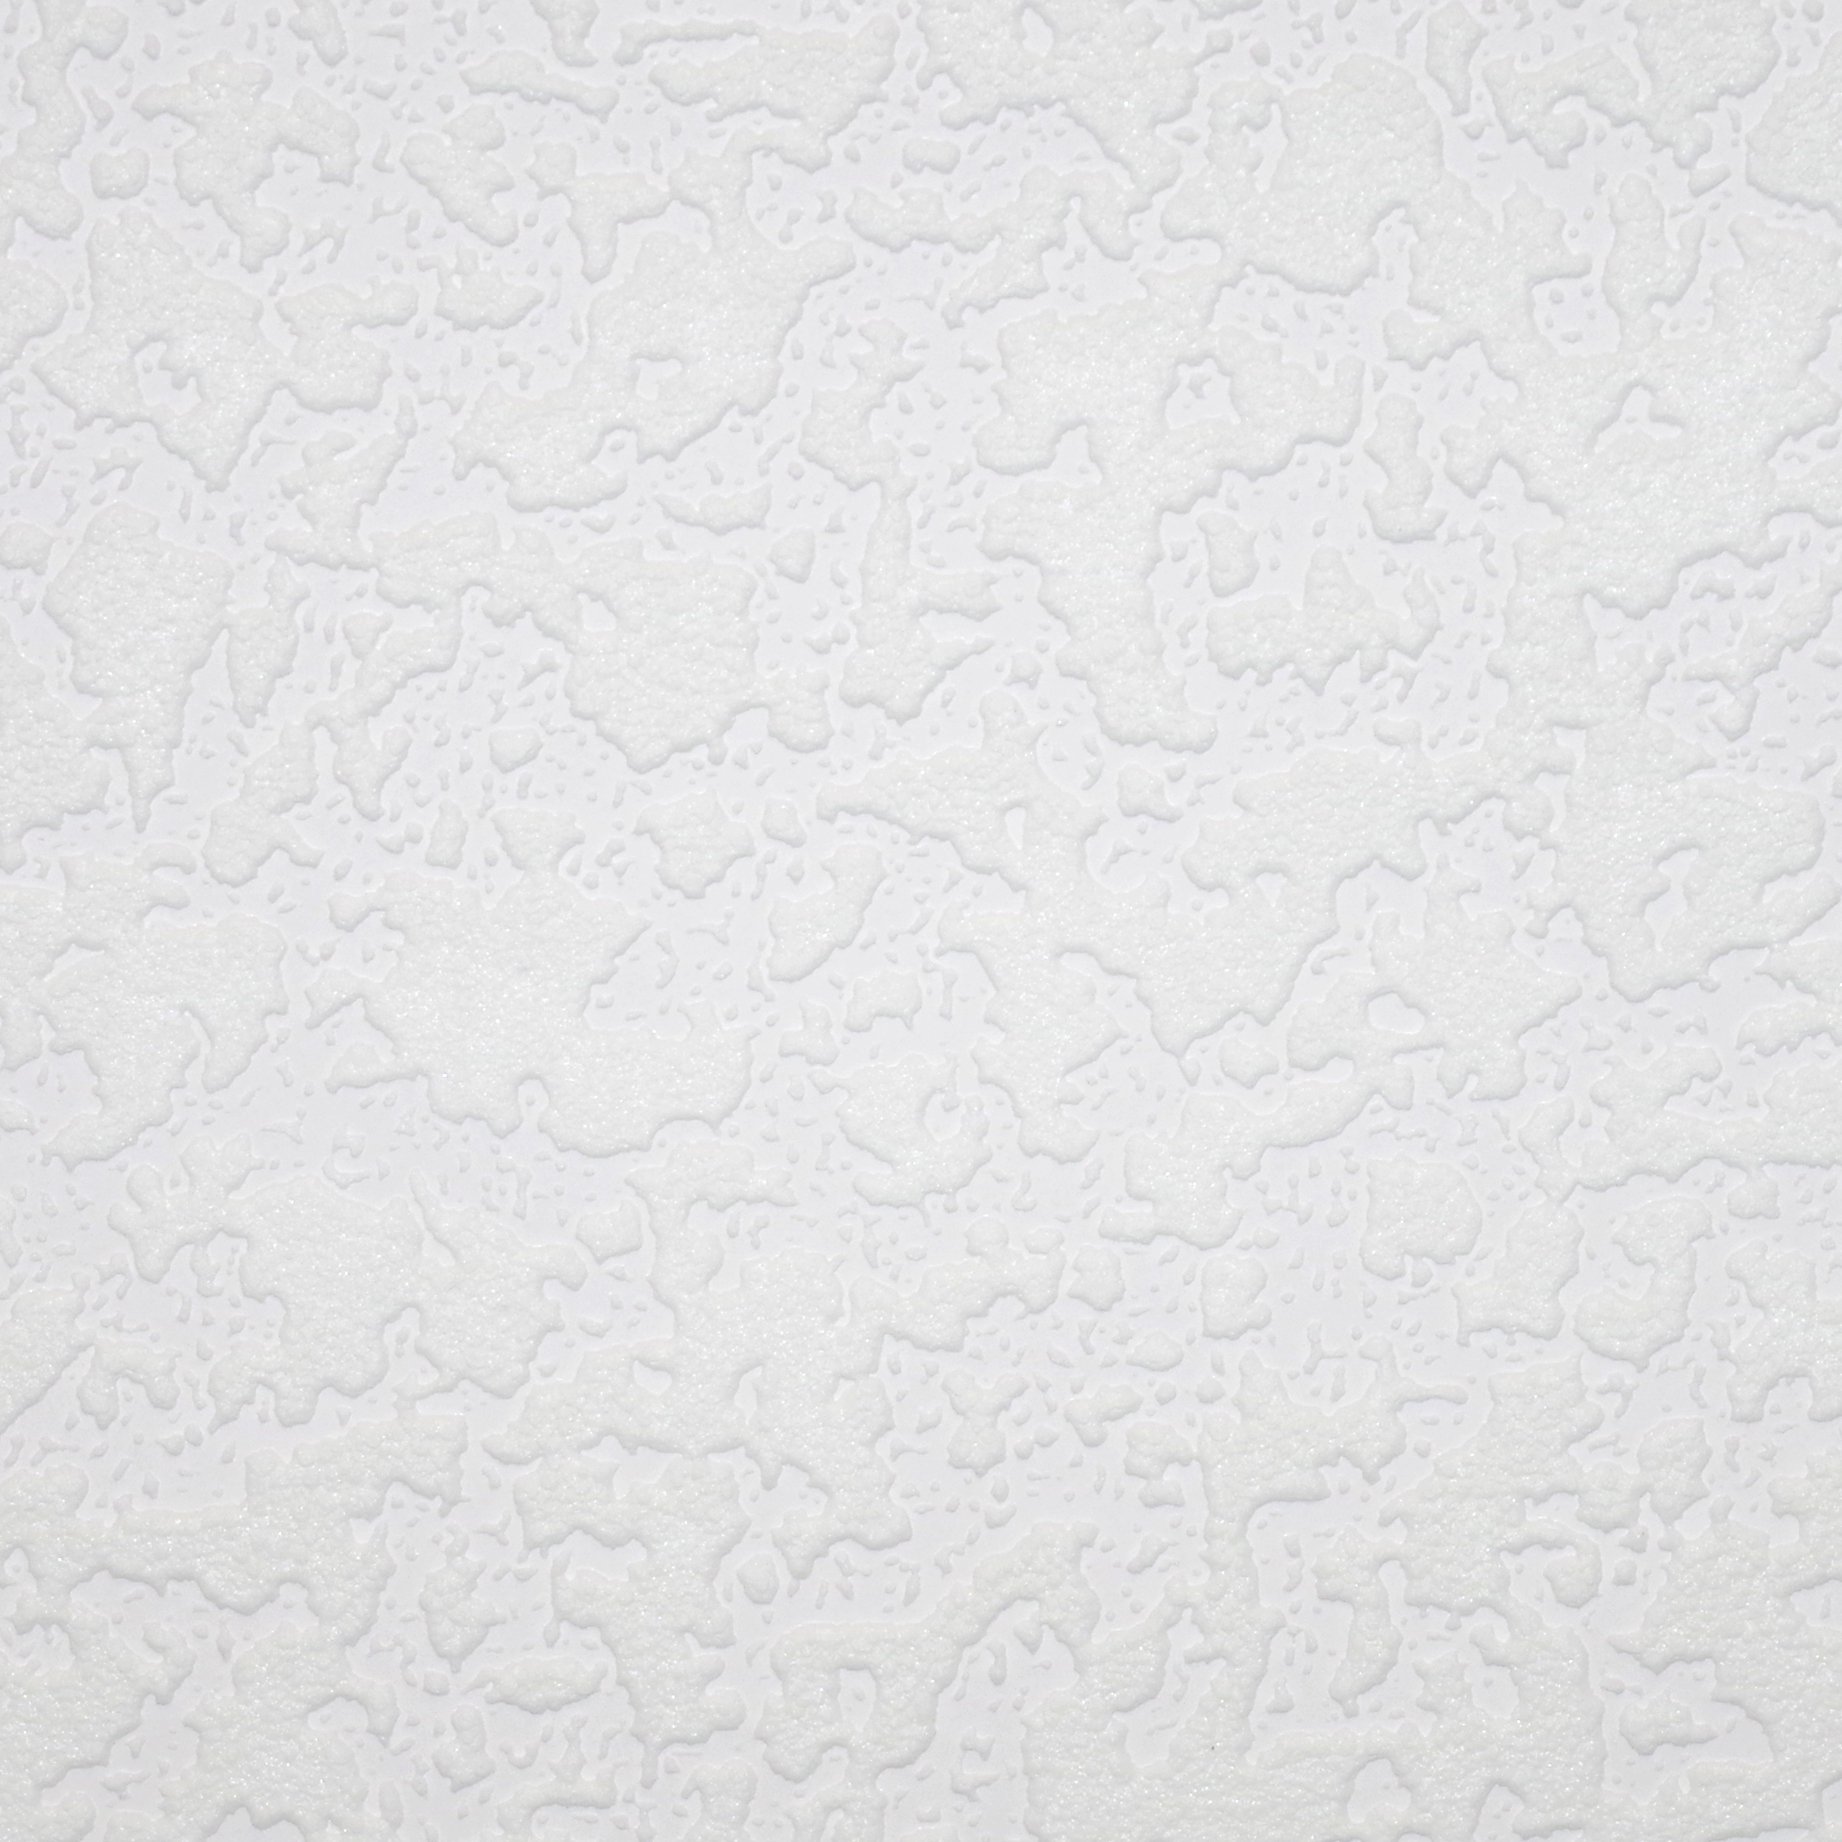 Fine decor textured blown vinyl wallpaper fd30910 cut for Textured vinyl wallpaper bathroom